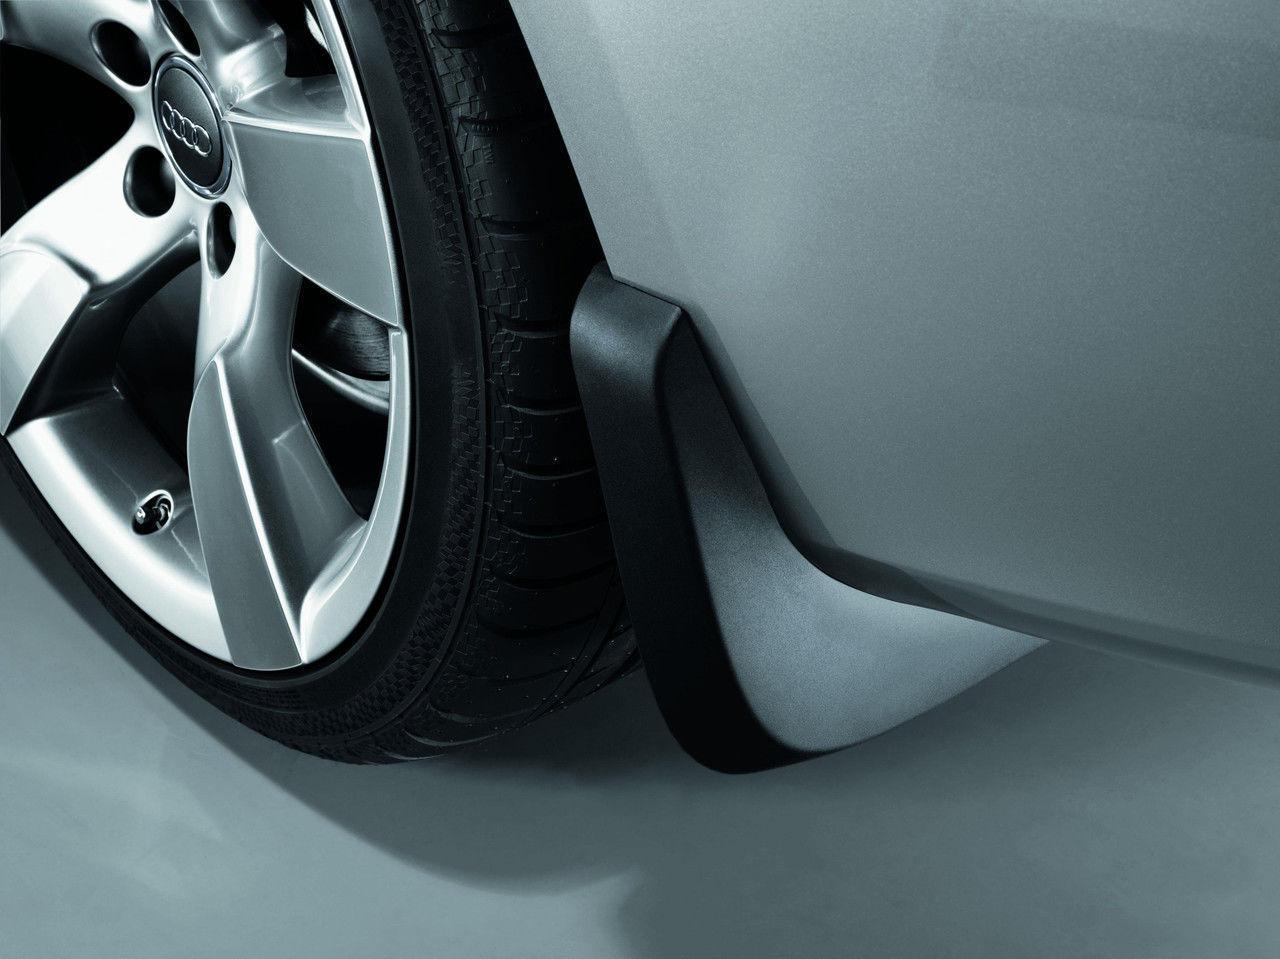 Брызговики задние Ауди А5 (Audi A5) 2008-2011 г (дорестайлинг)